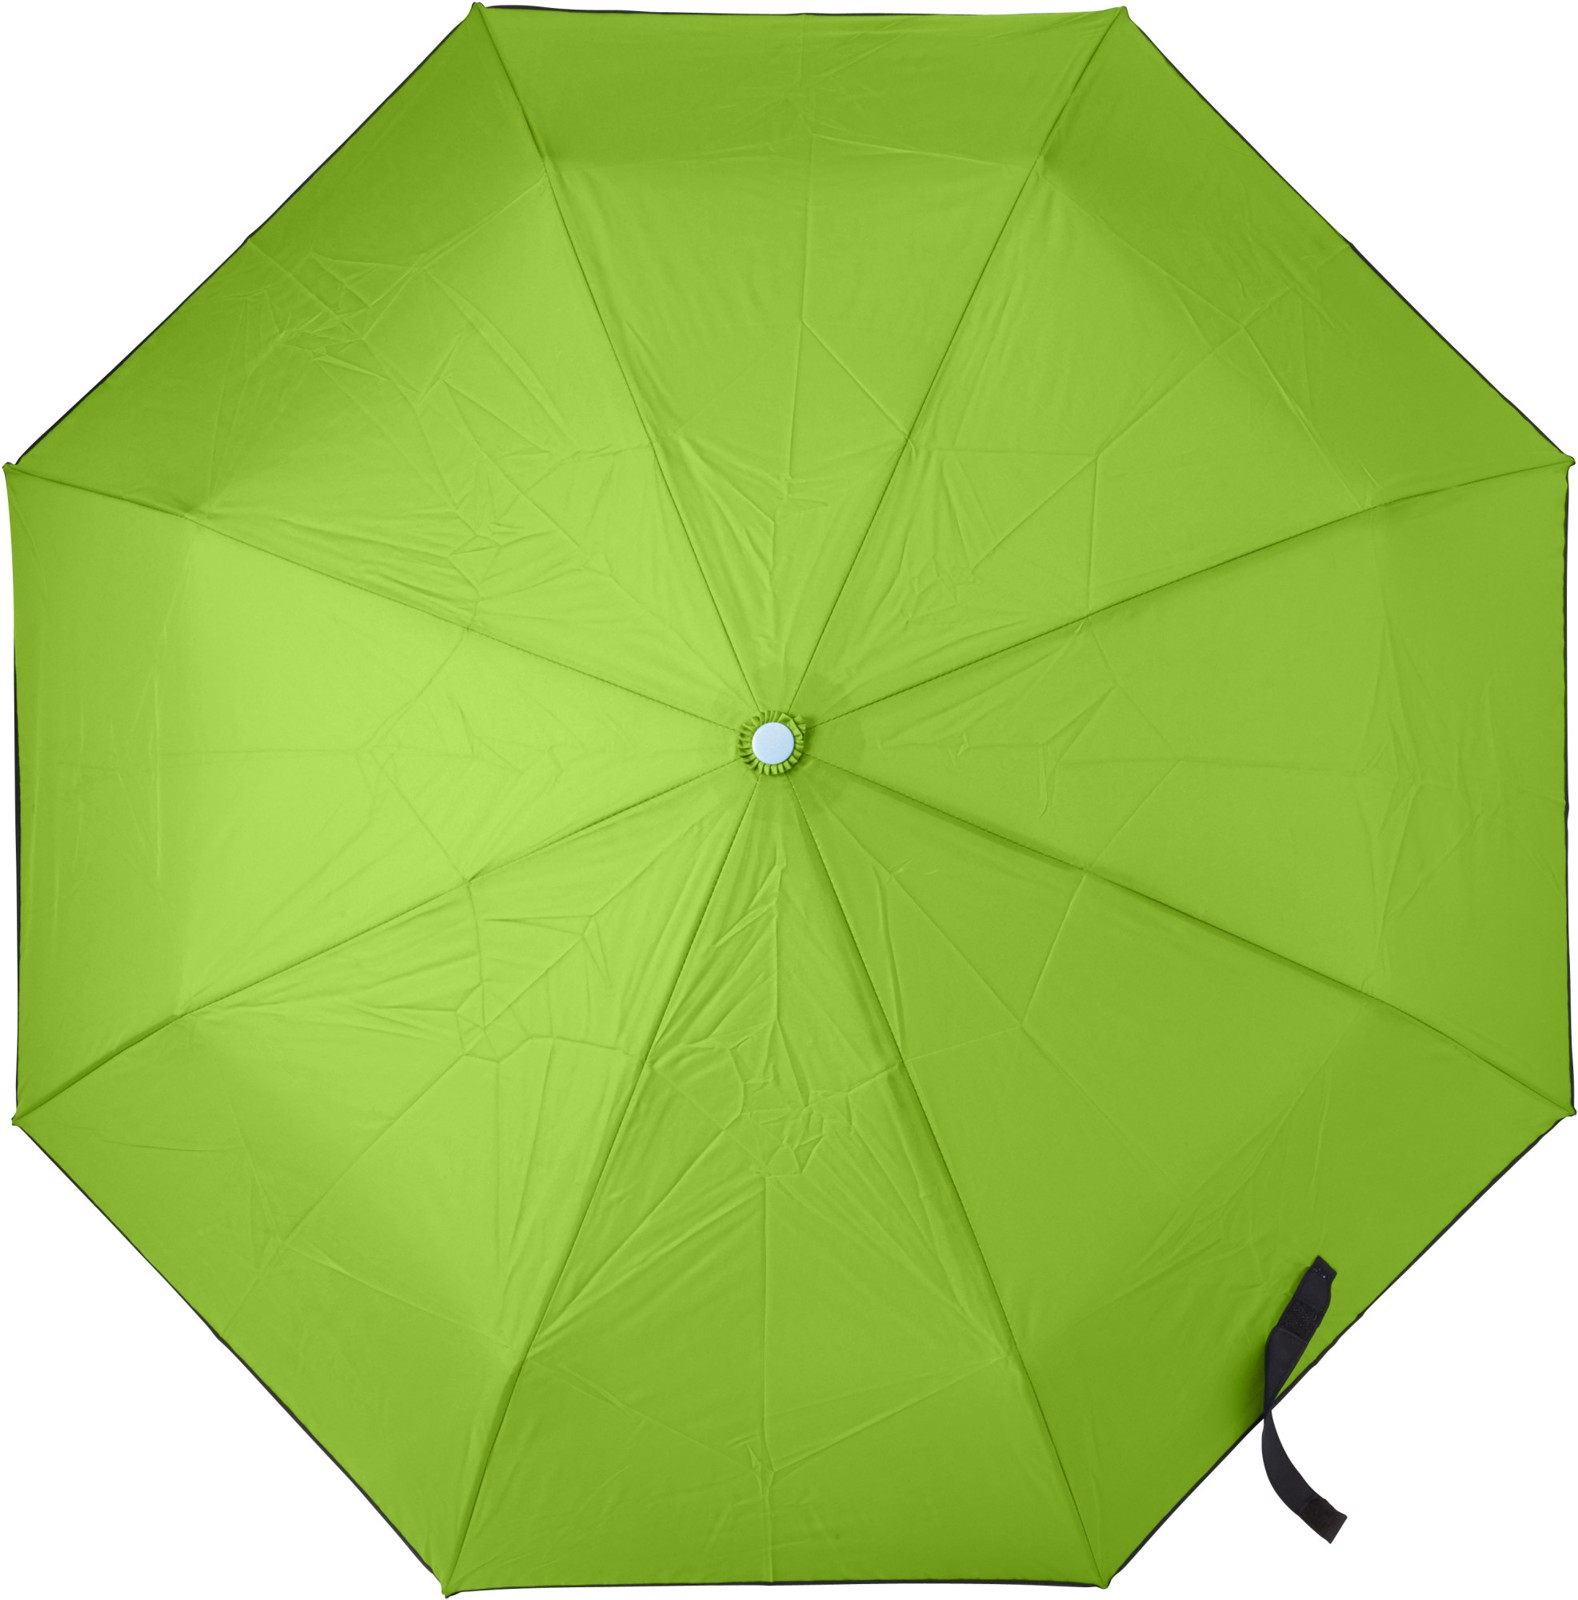 Pongee umbrella - Lime